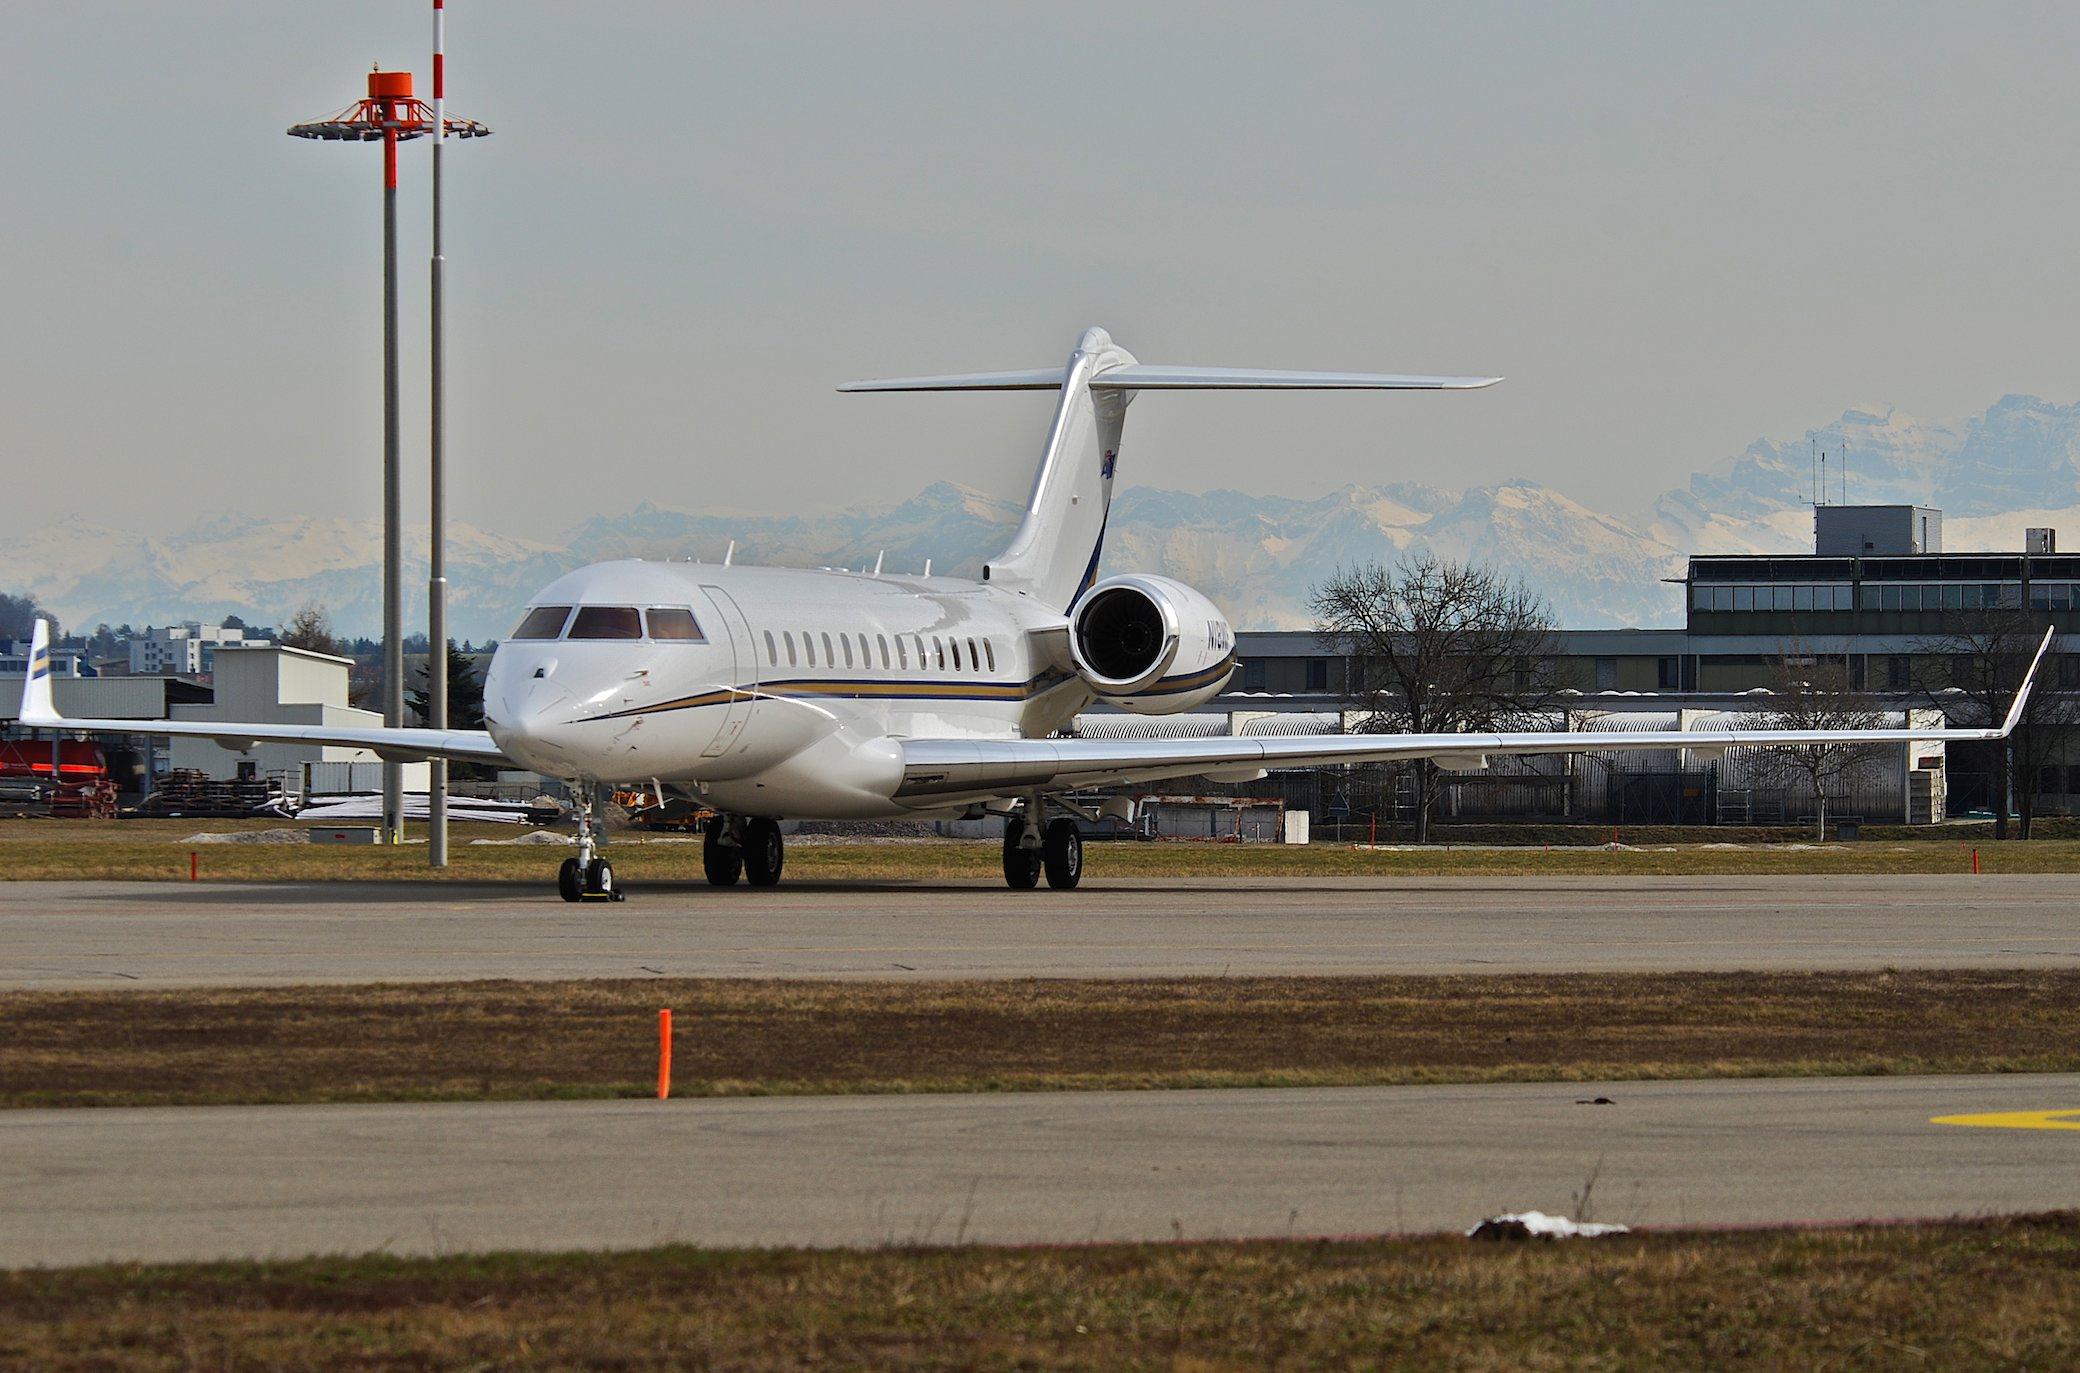 Untitled (Westfield Aviation) Bombardier BD-700-1A10 Global Express; N18WF@ZRH;18.03.2010 par Aero Icarus sous (CC BY-SA 2.0) https://www.flickr.com/photos/aero_icarus/4444300616/